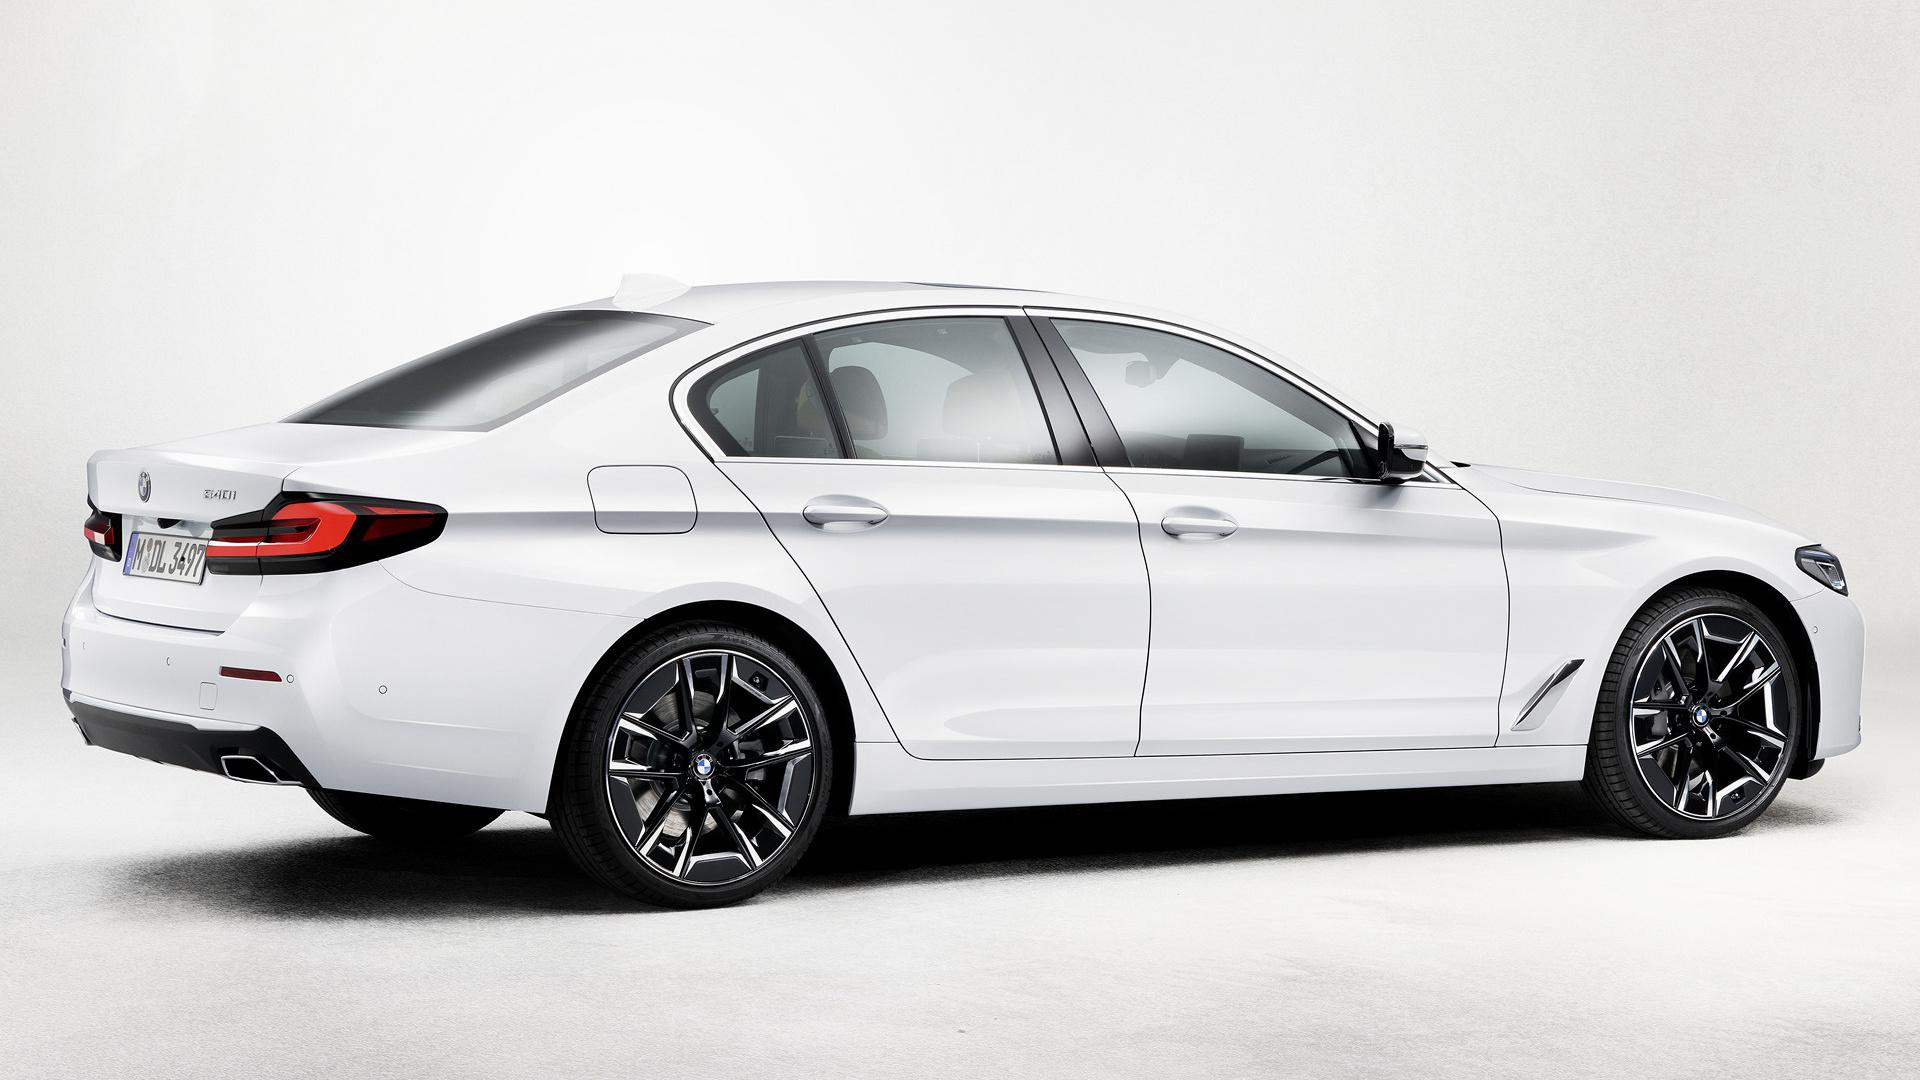 2020 BMW 550I Pricing